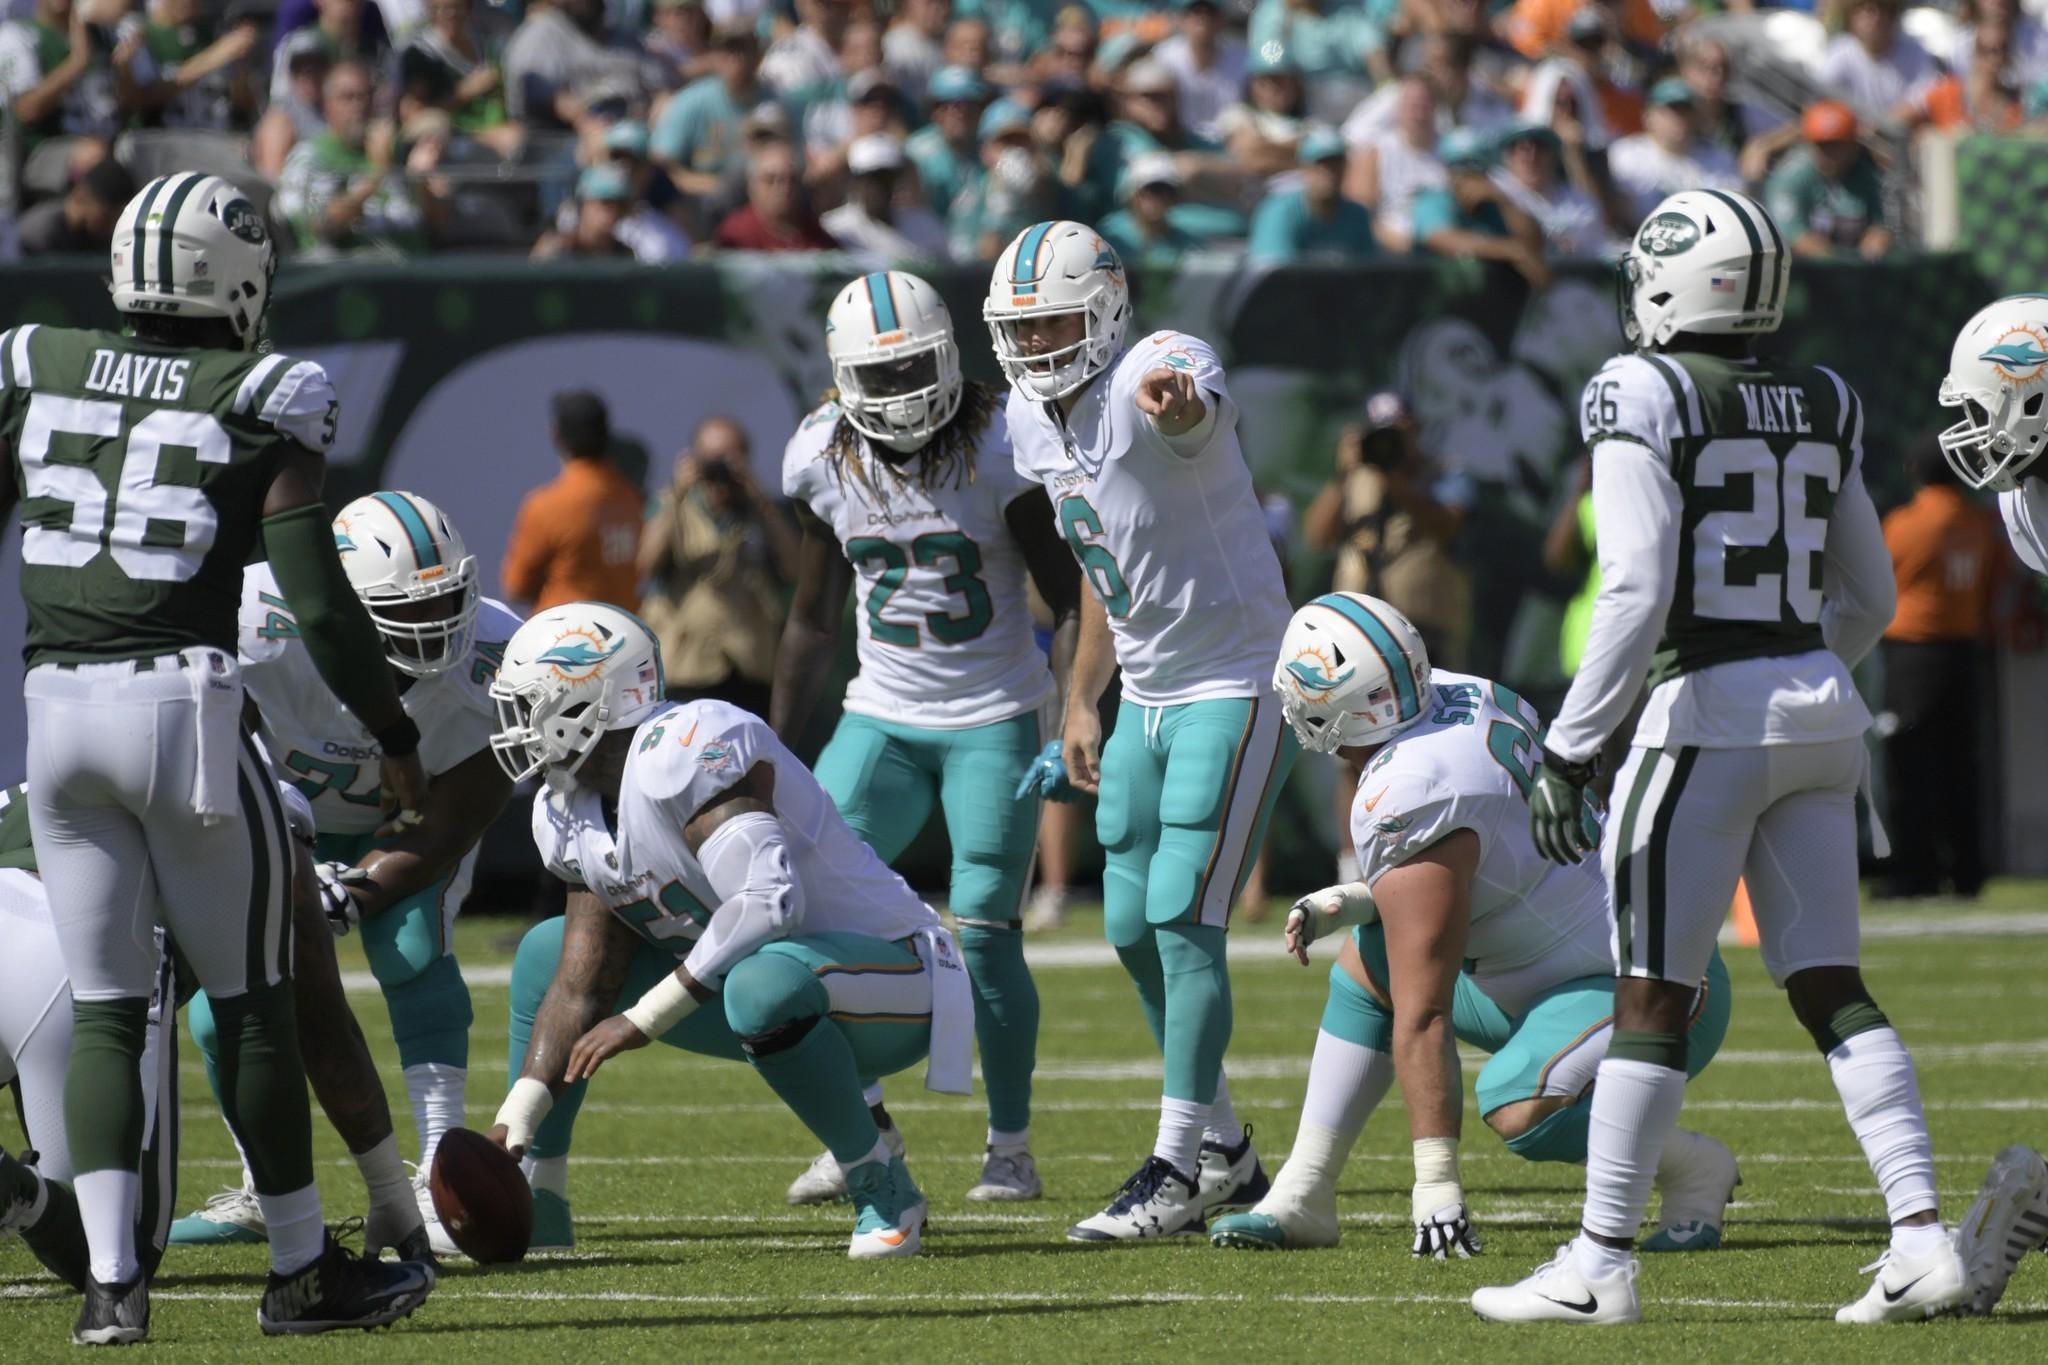 Sfl-miami-dolphins-vs-new-york-jets-who-has-the-edge-20171019